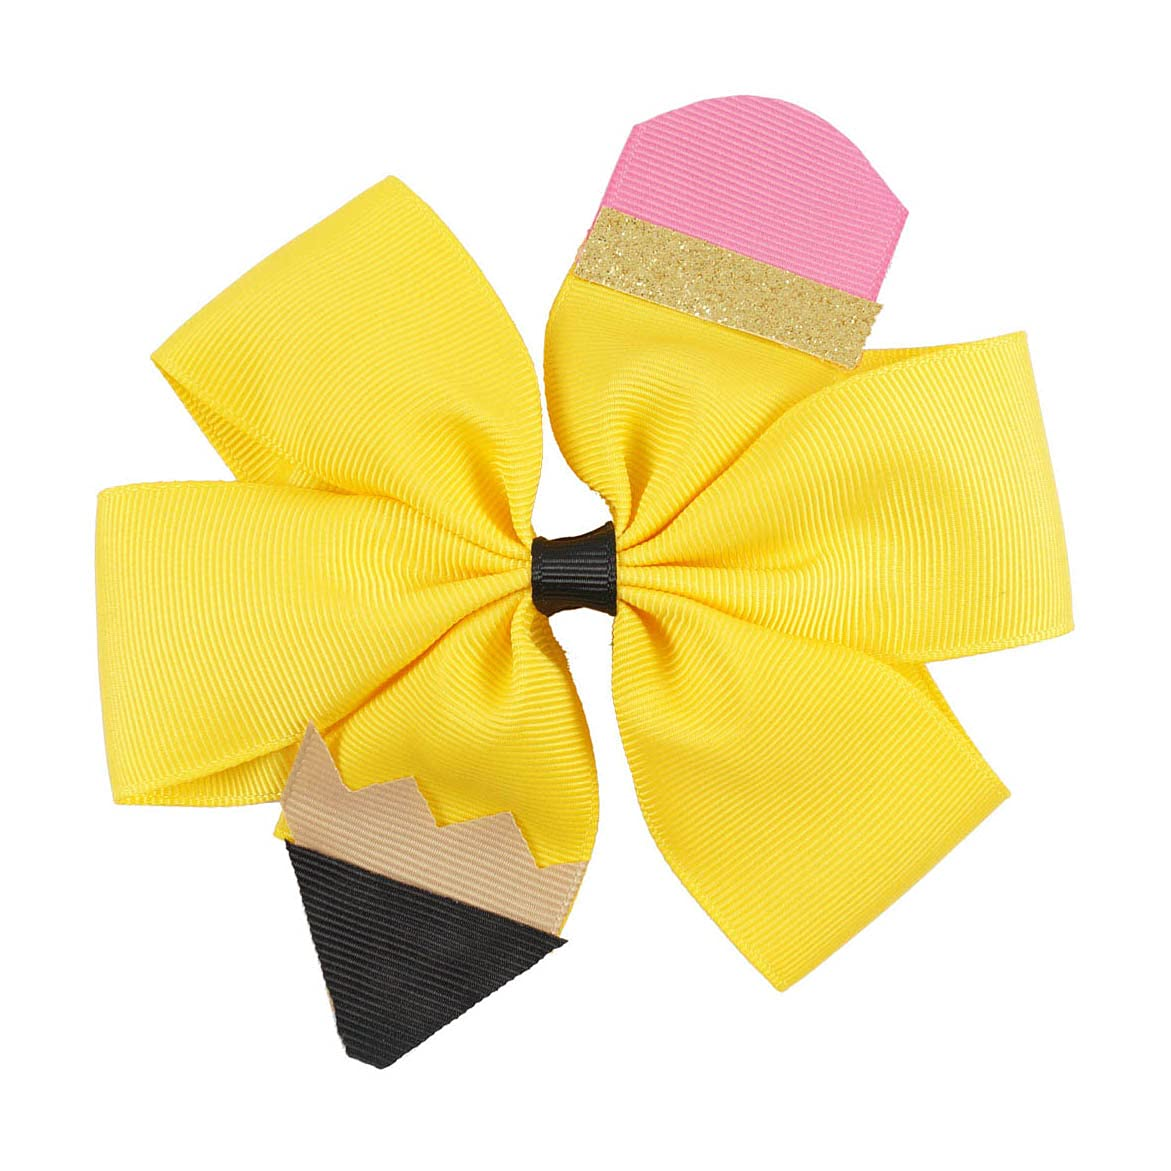 Pencil Girls Hair Bow Ponytail Holder Jumbo Hair Clips For Cheerleader Girls JBC13 (Hair Clip-Yellow-1)